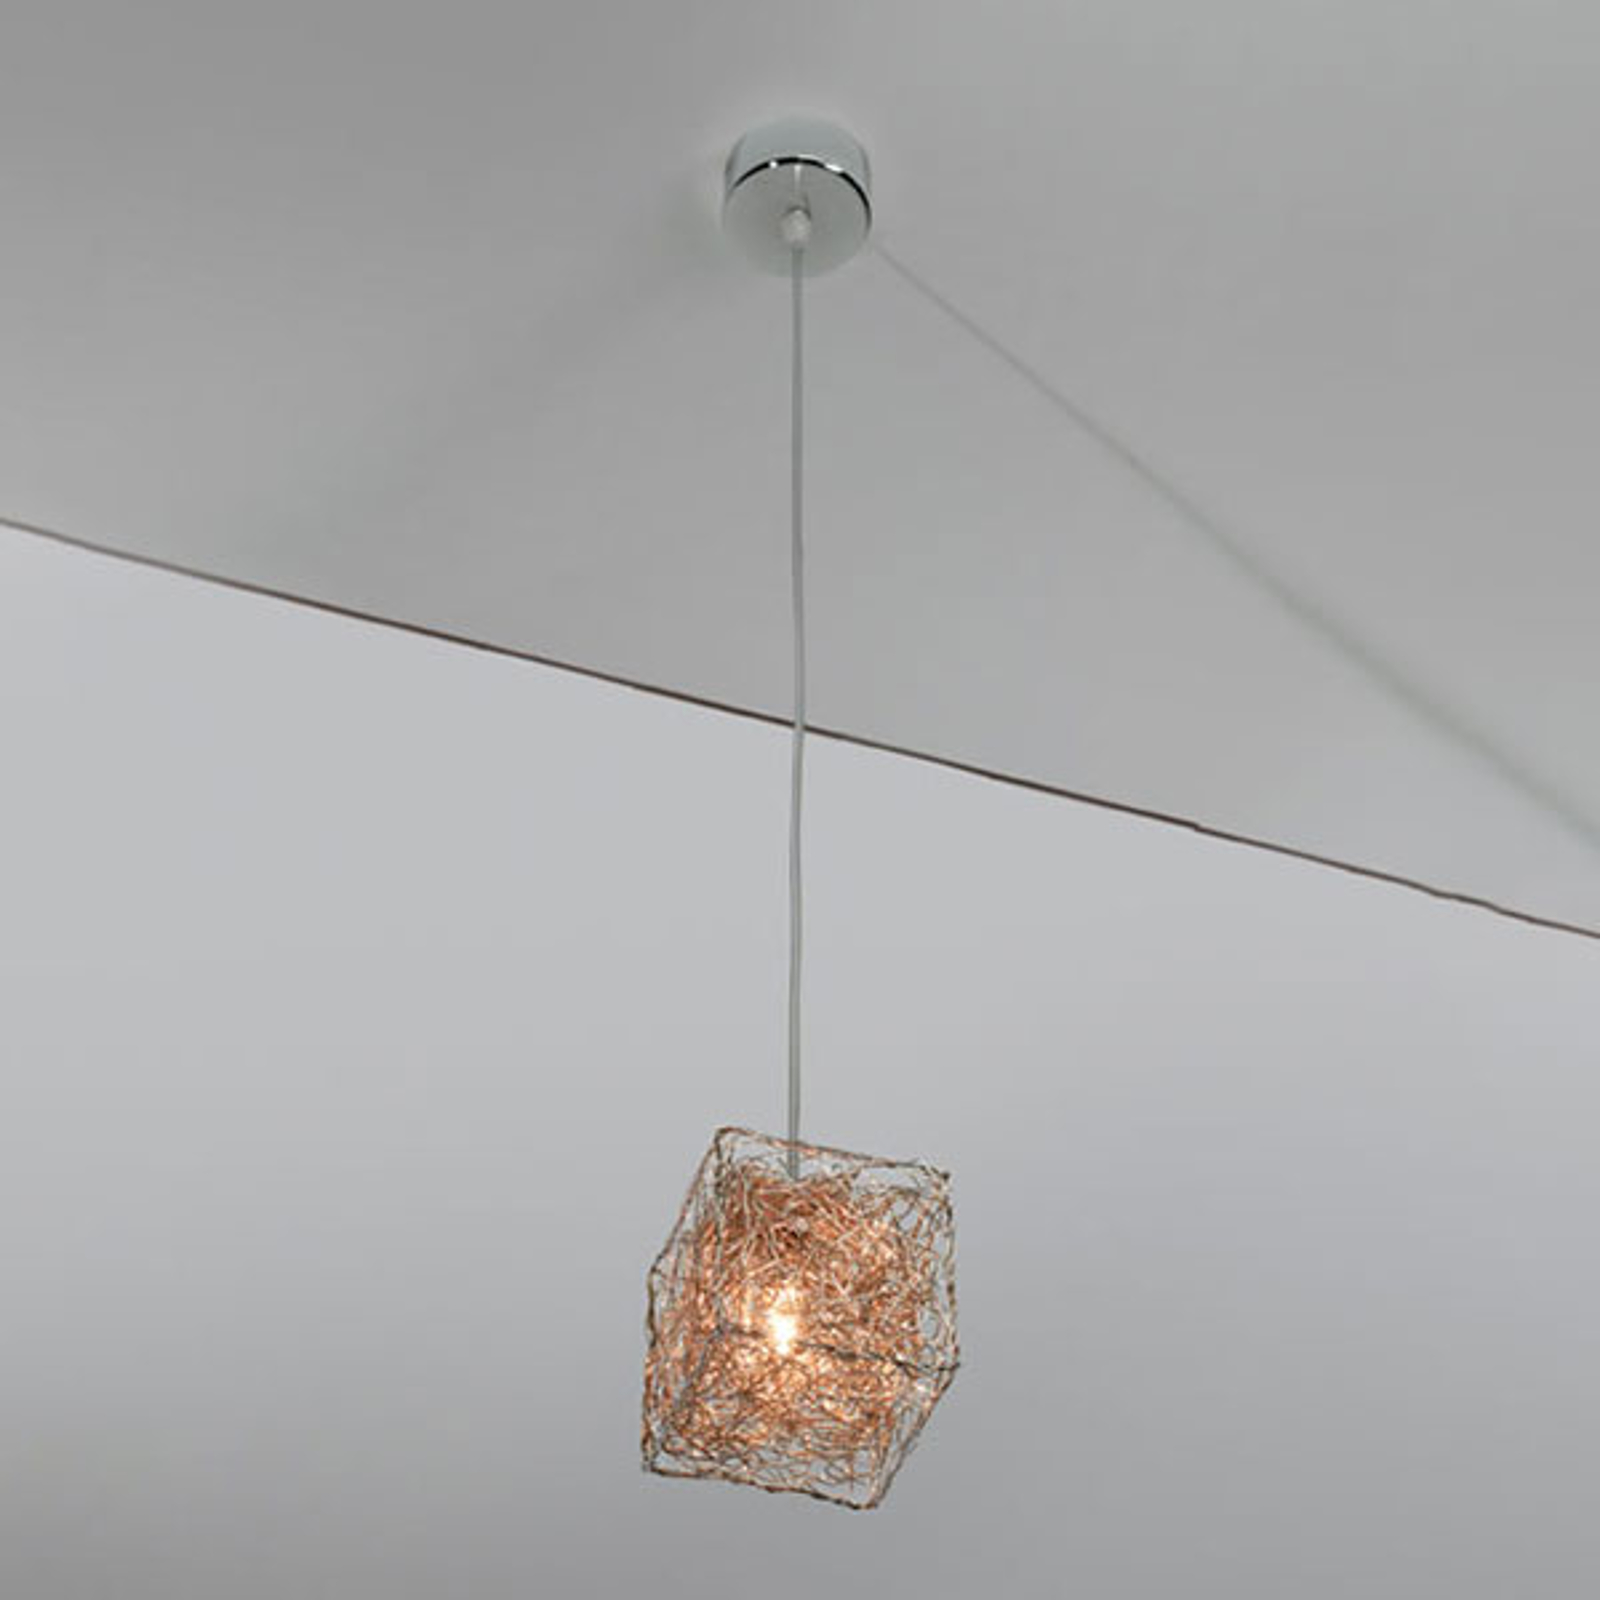 Mała designerska lampa wisząca LED Kubini